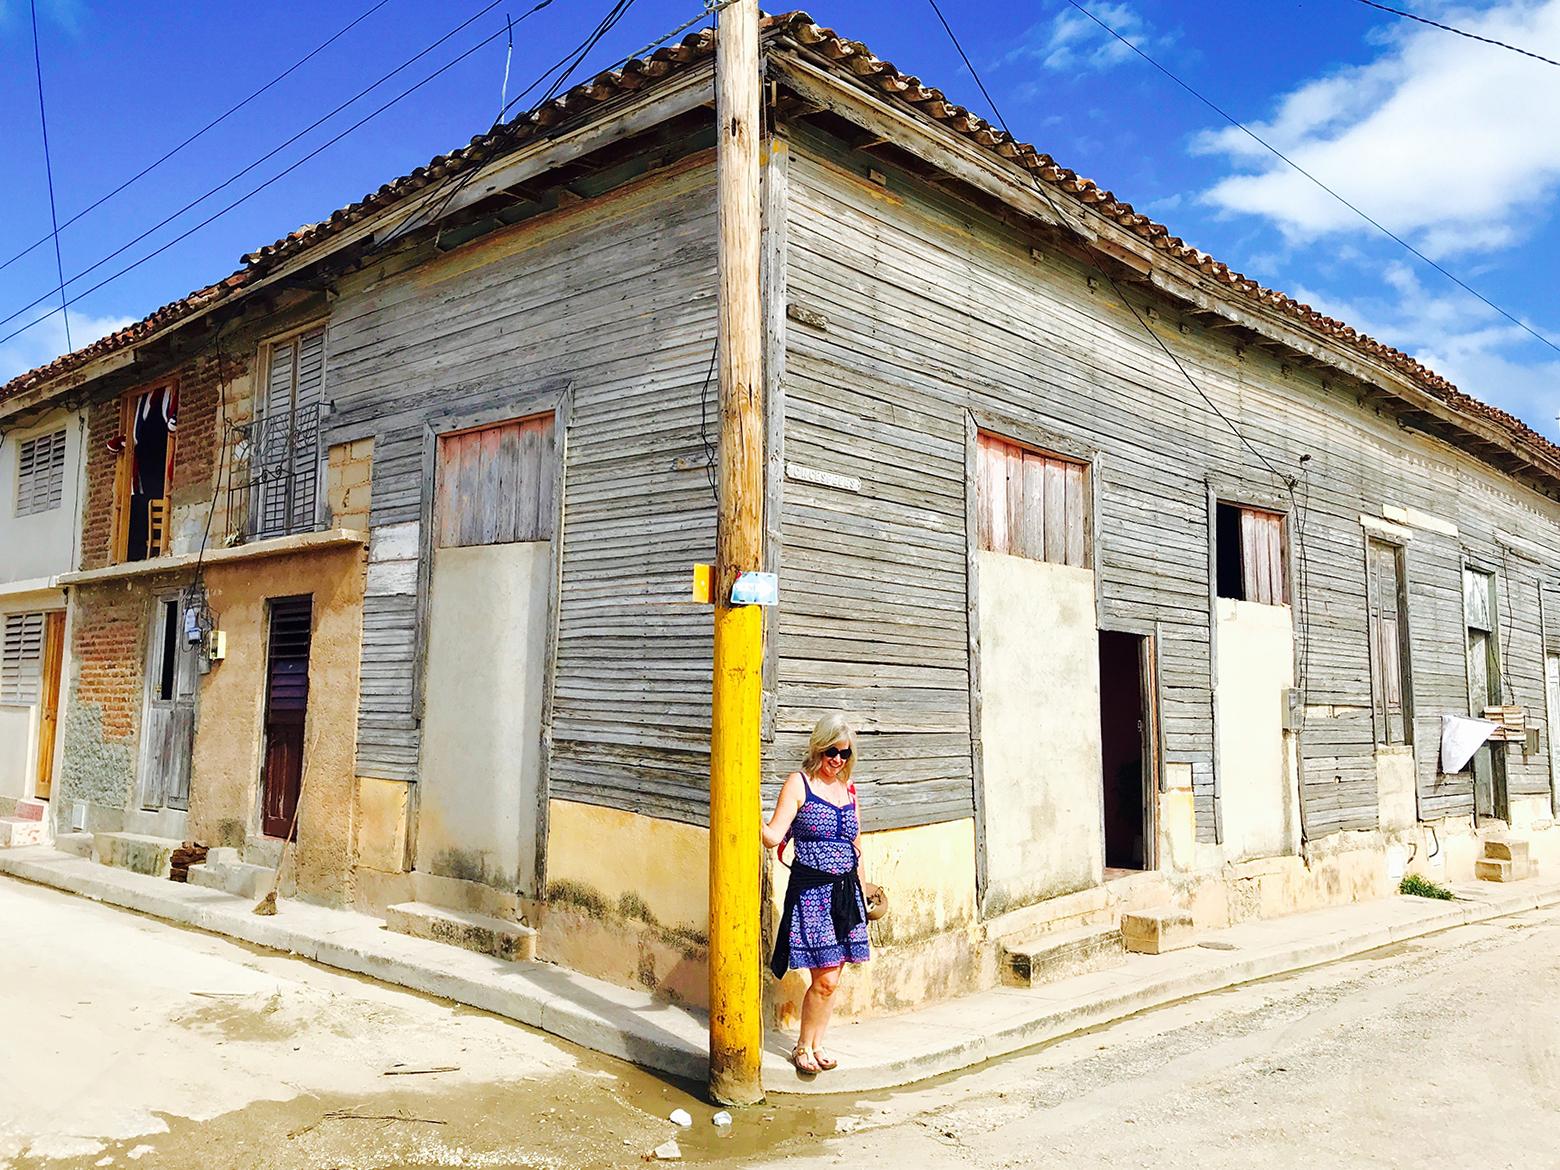 Bonnie Munday in Gibara, Cuba